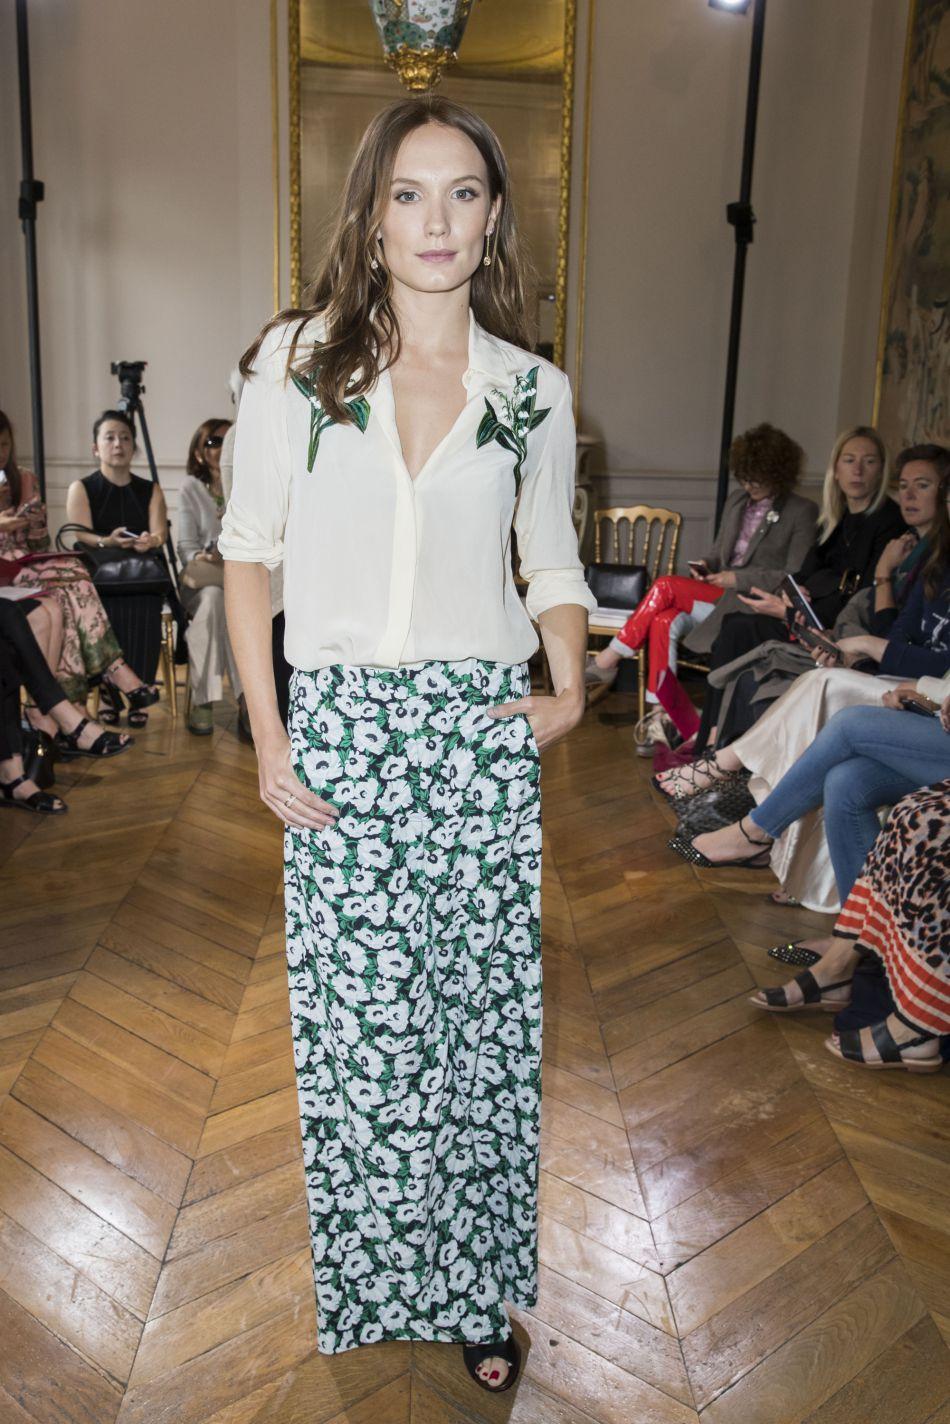 Ana Girardot, jolie comme un coeur chez Boucheron, dans un look 100% fleuri.